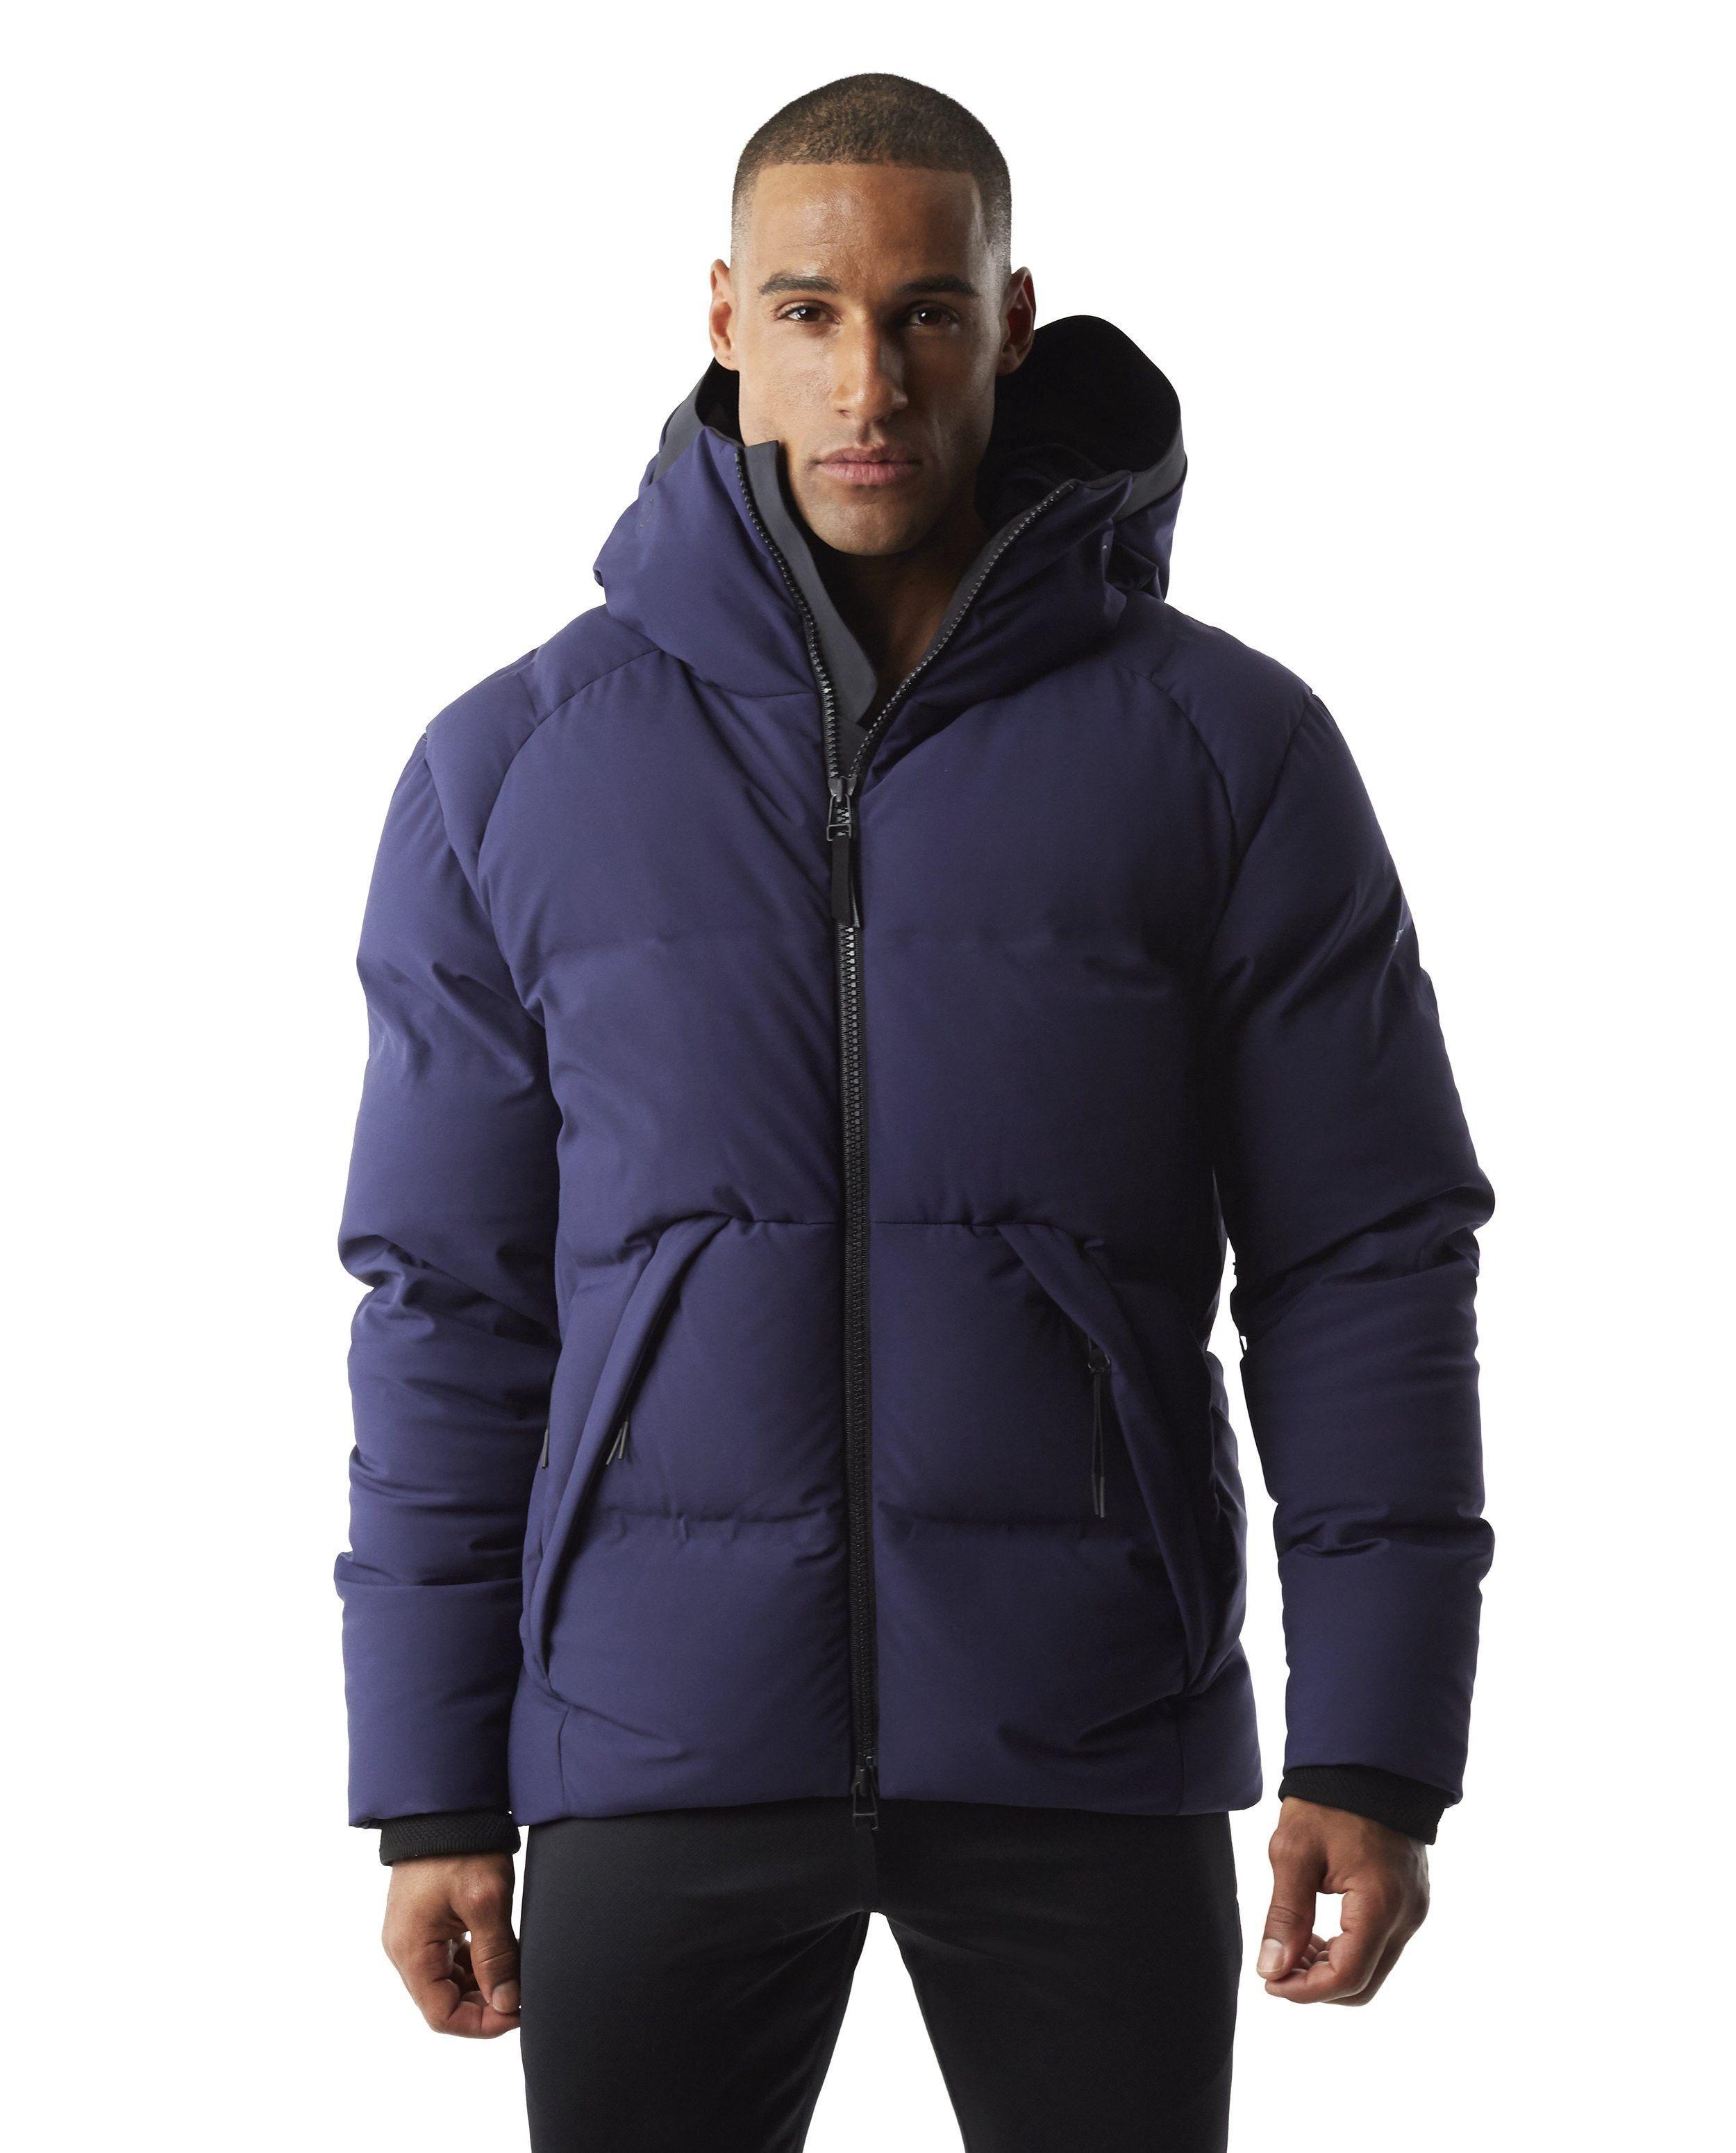 Isaora Voyager Jacket S Jackets, Waterproof fabric